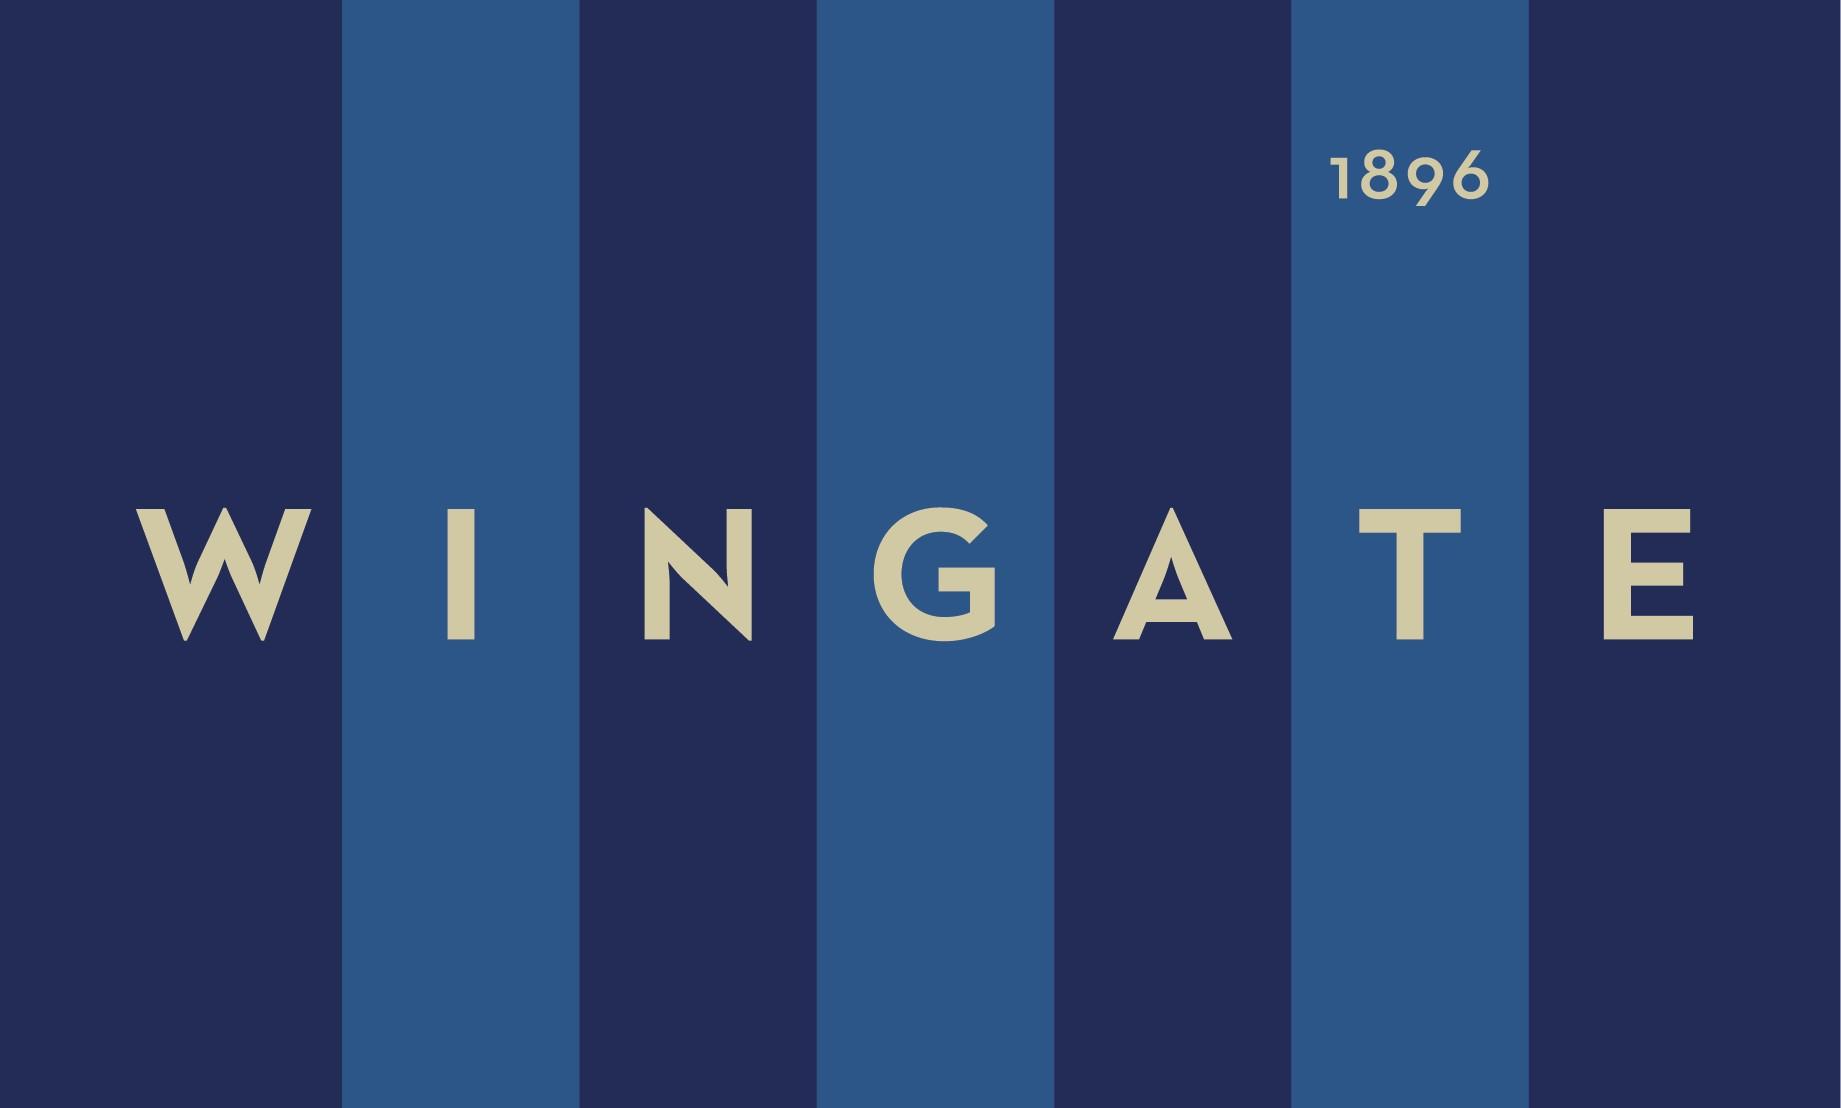 Wingate University | LinkedIn